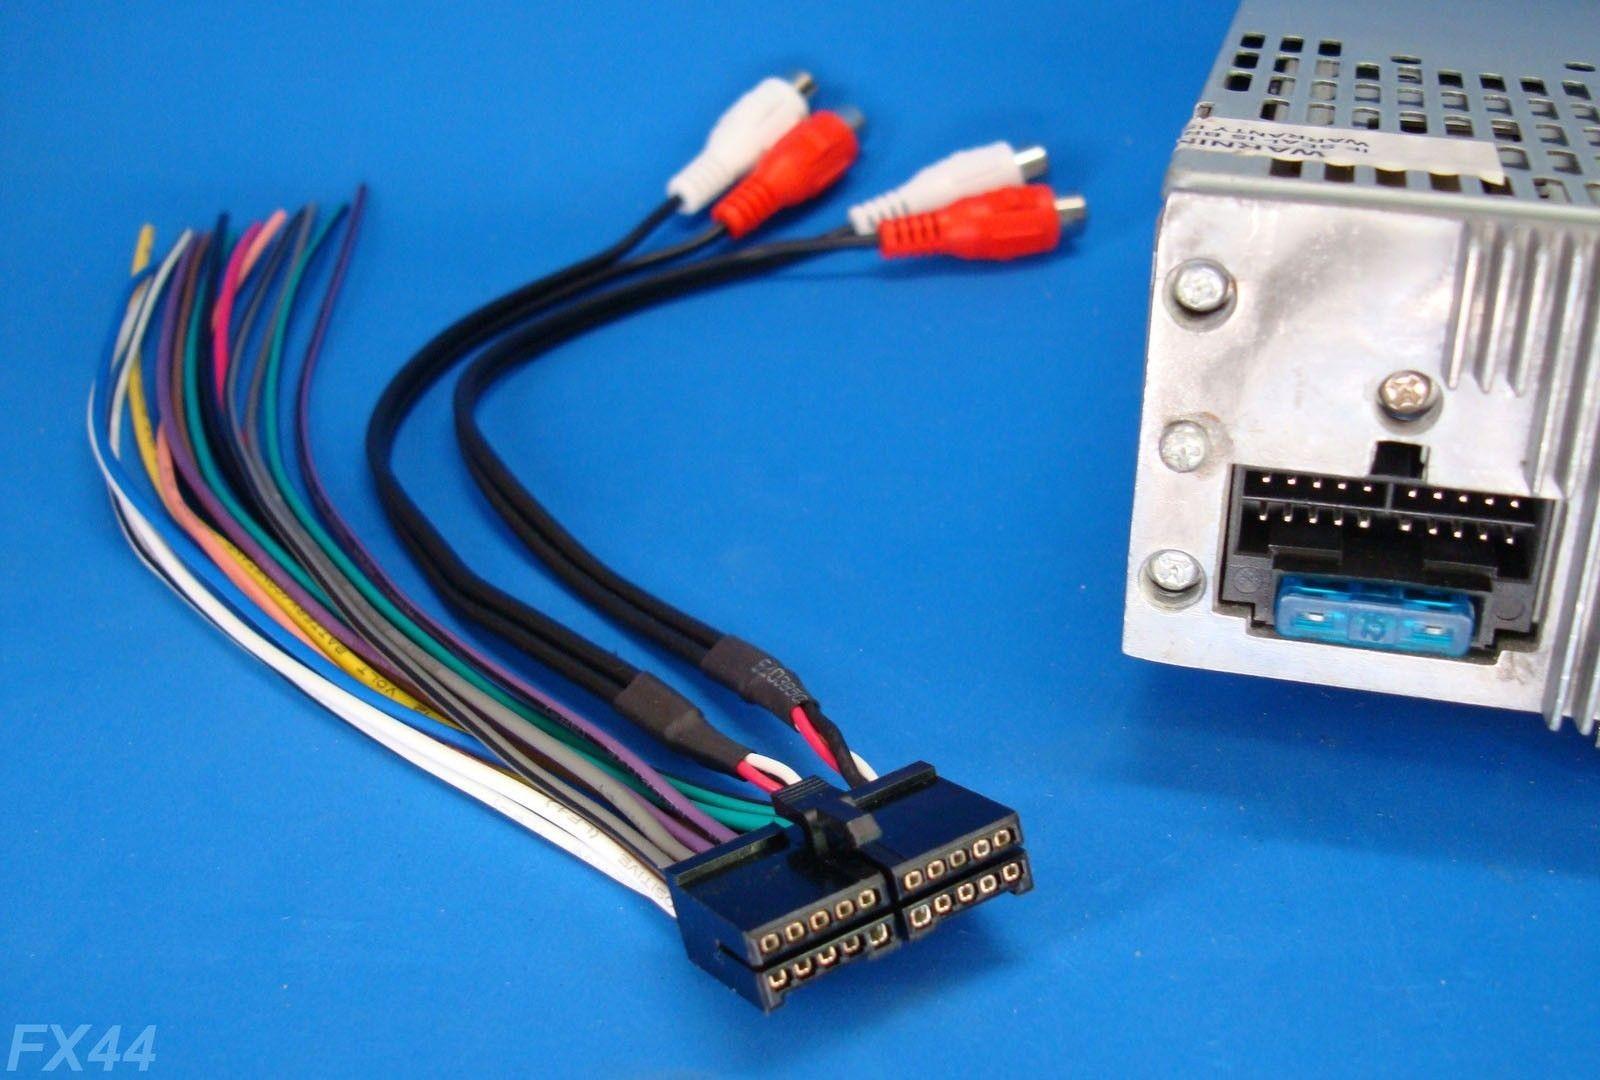 xo vision wiring harness download wiring diagrams u2022 rh wiringdiagramblog today XO Vision Parts Bose Acoustimass 10 Wiring Diagram